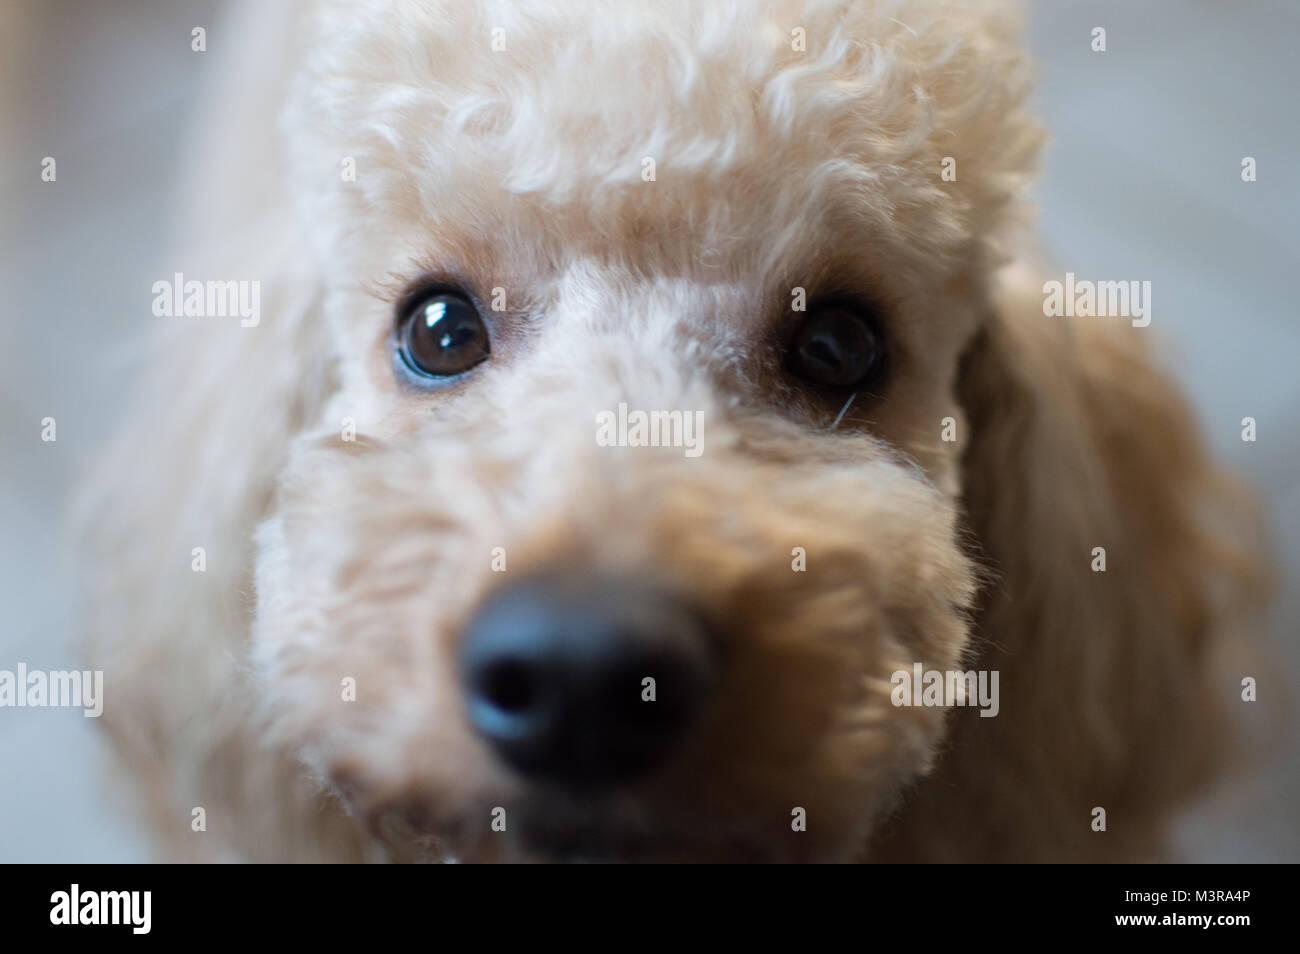 Good poodle boy - Stock Image